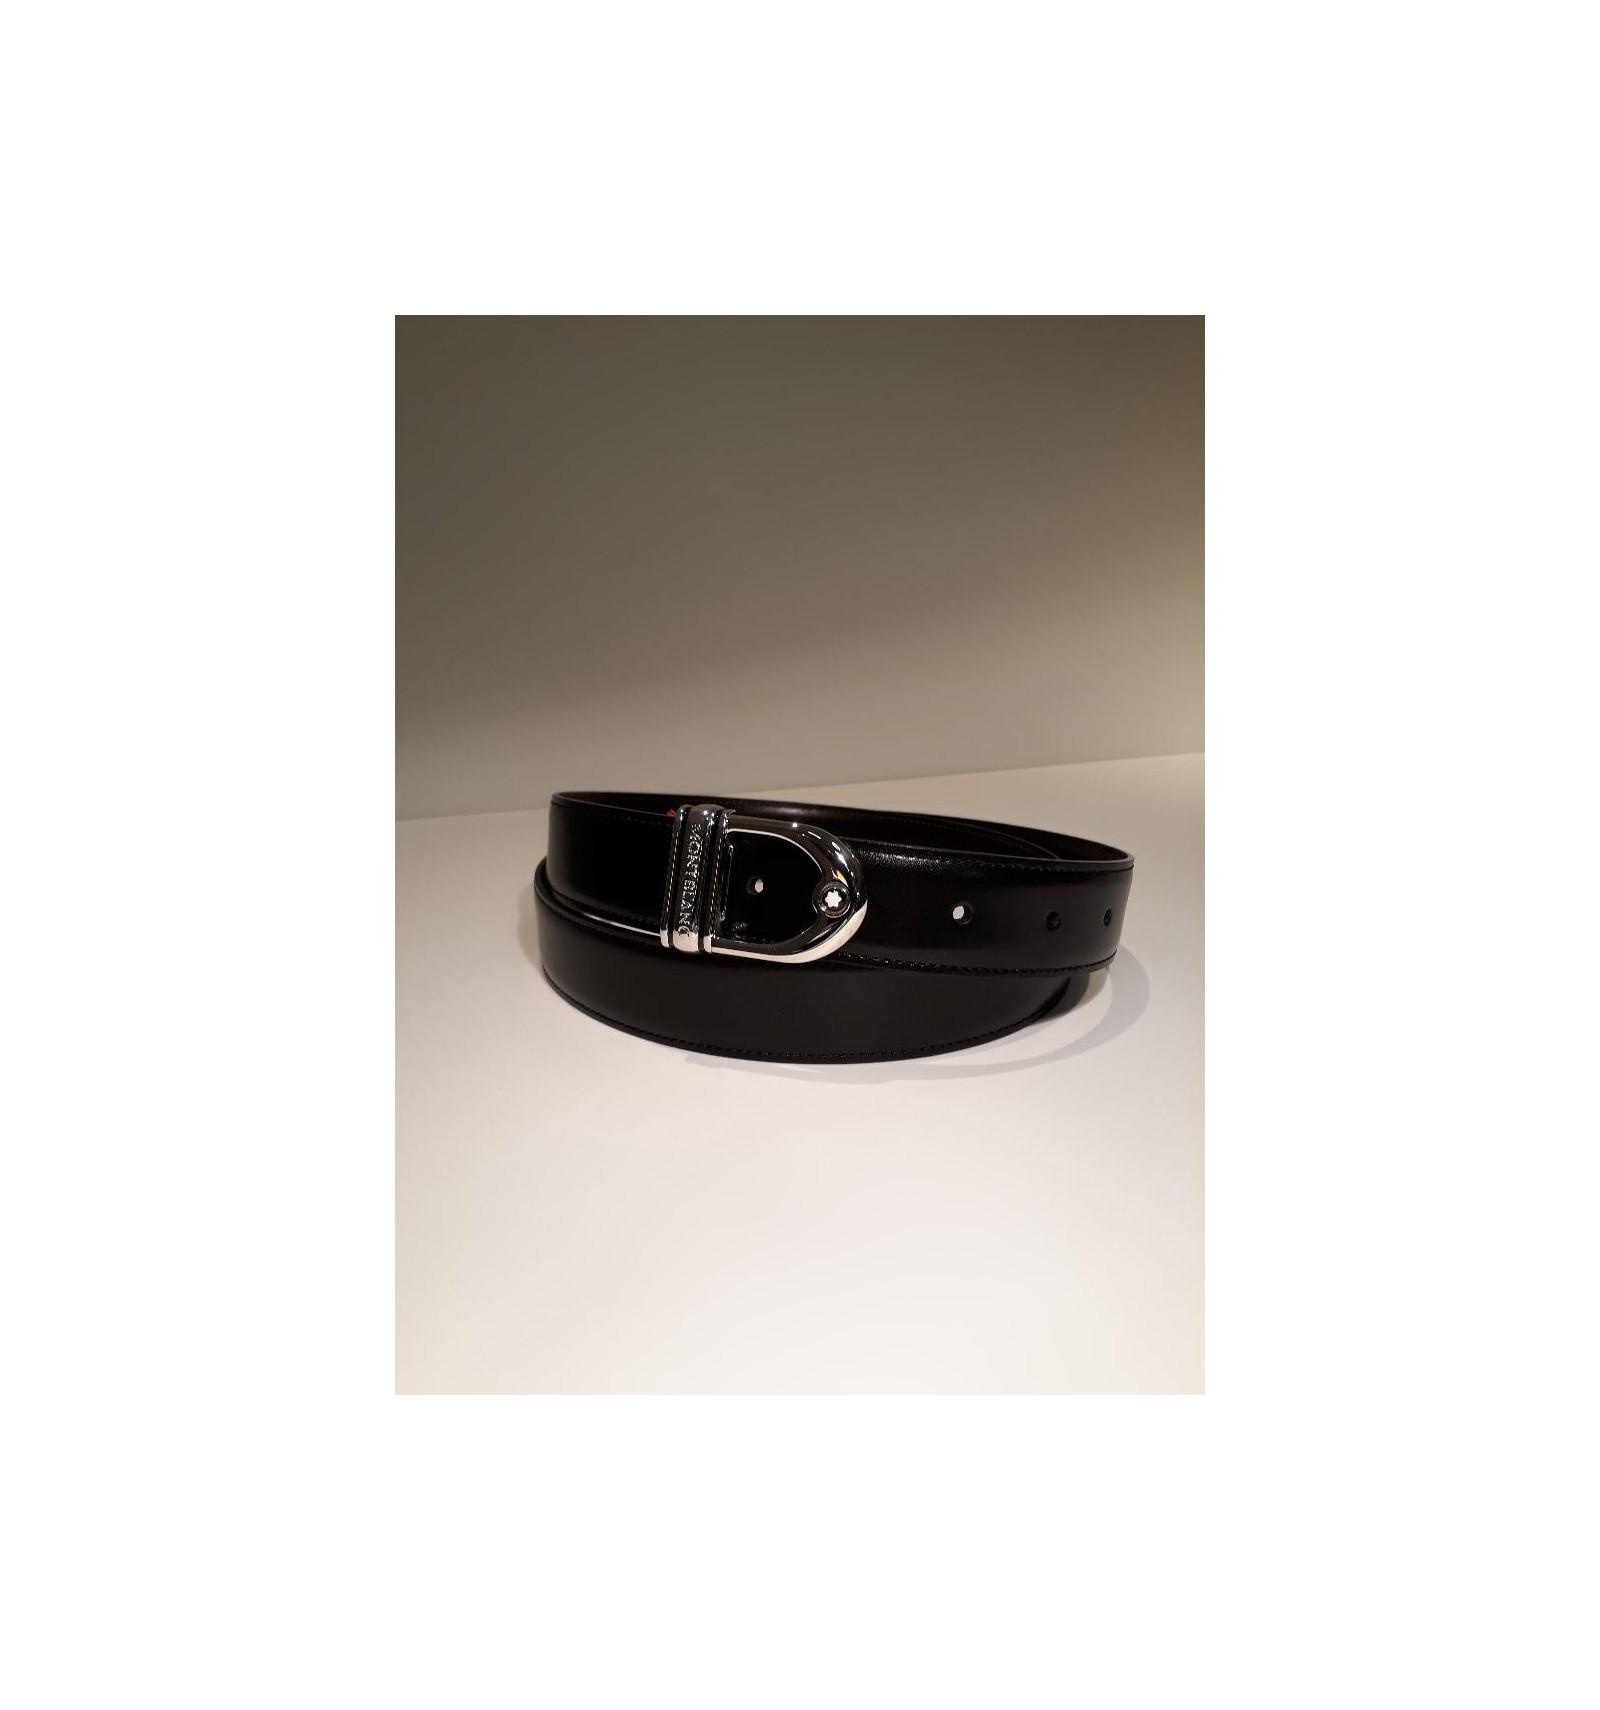 a44a0c3aa731 ceinture montblanc boucle plate